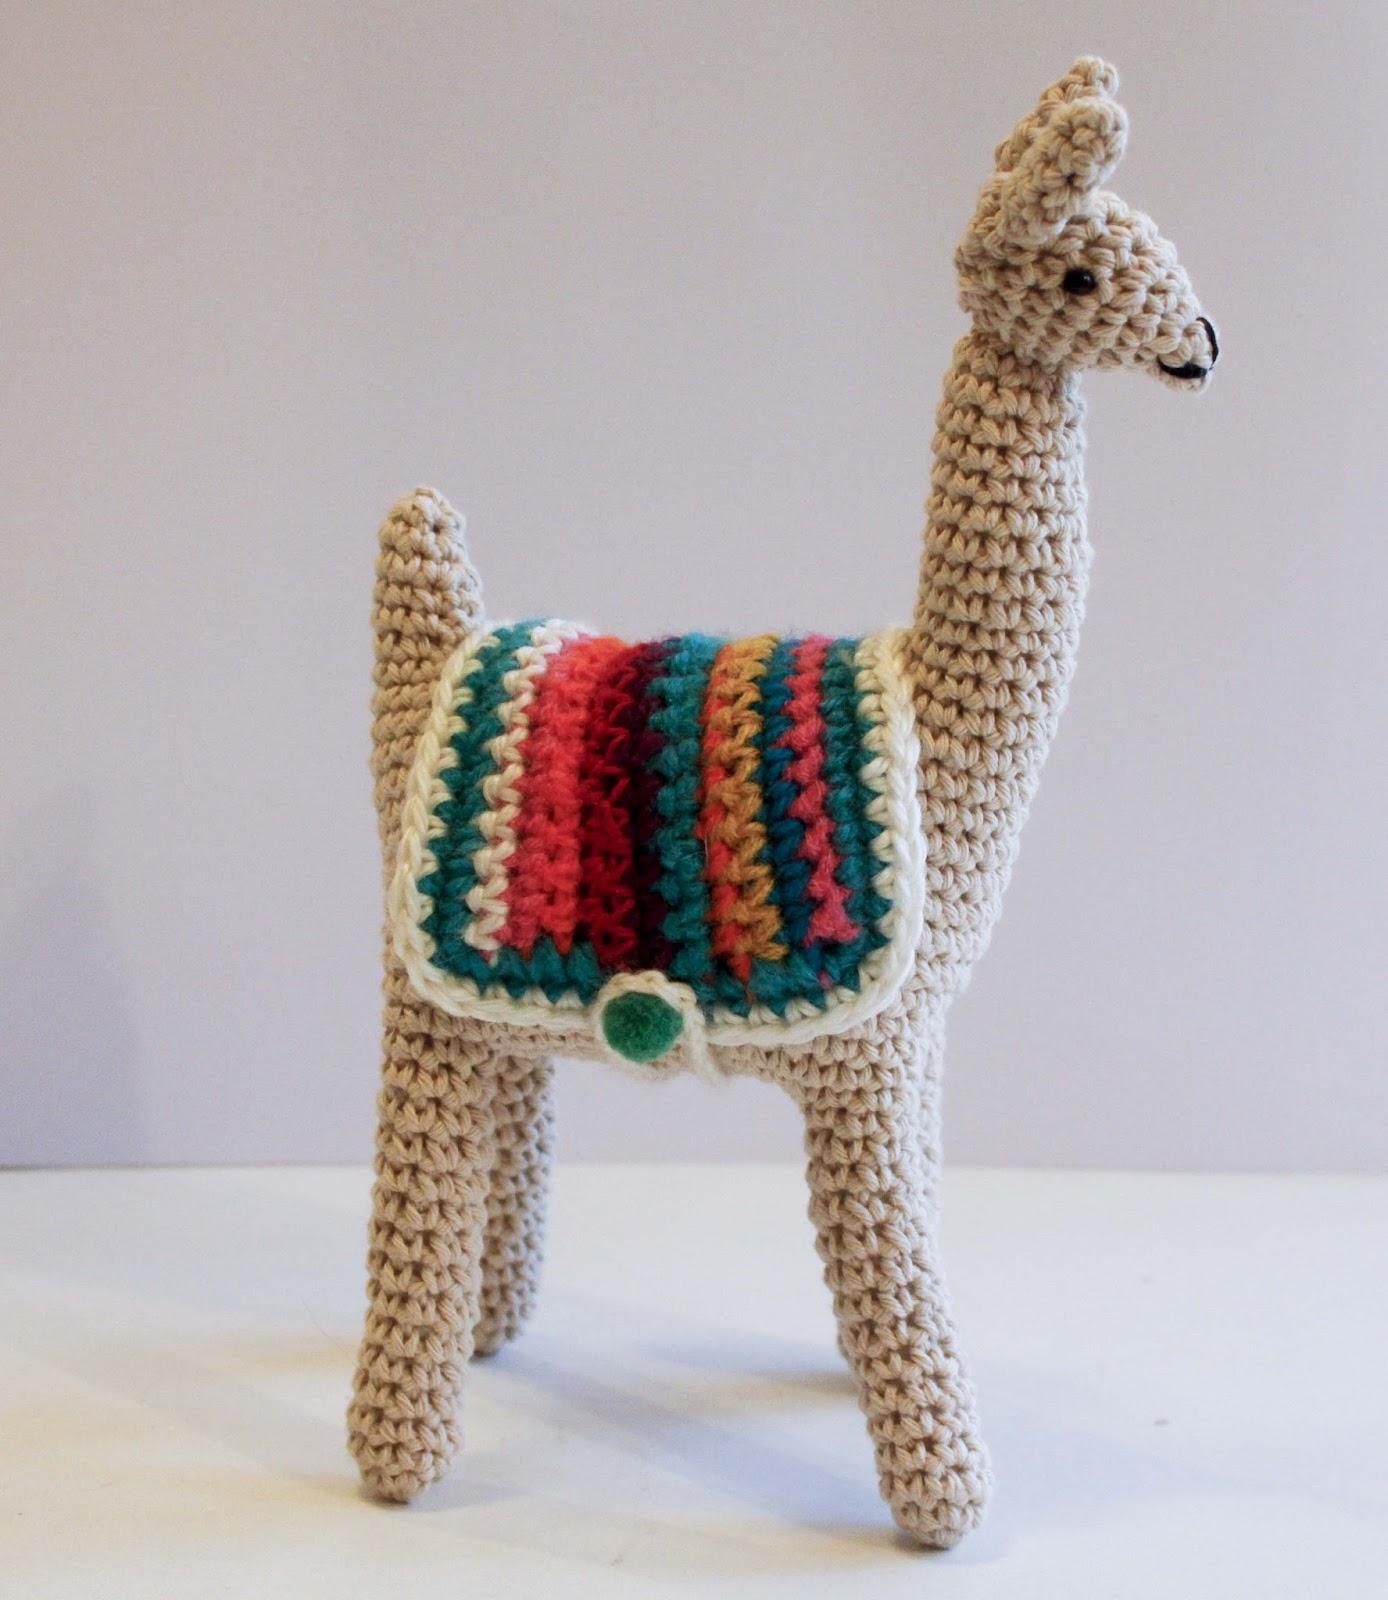 Amigurumi Llama Free Pattern : Crochet, Google and Search on Pinterest